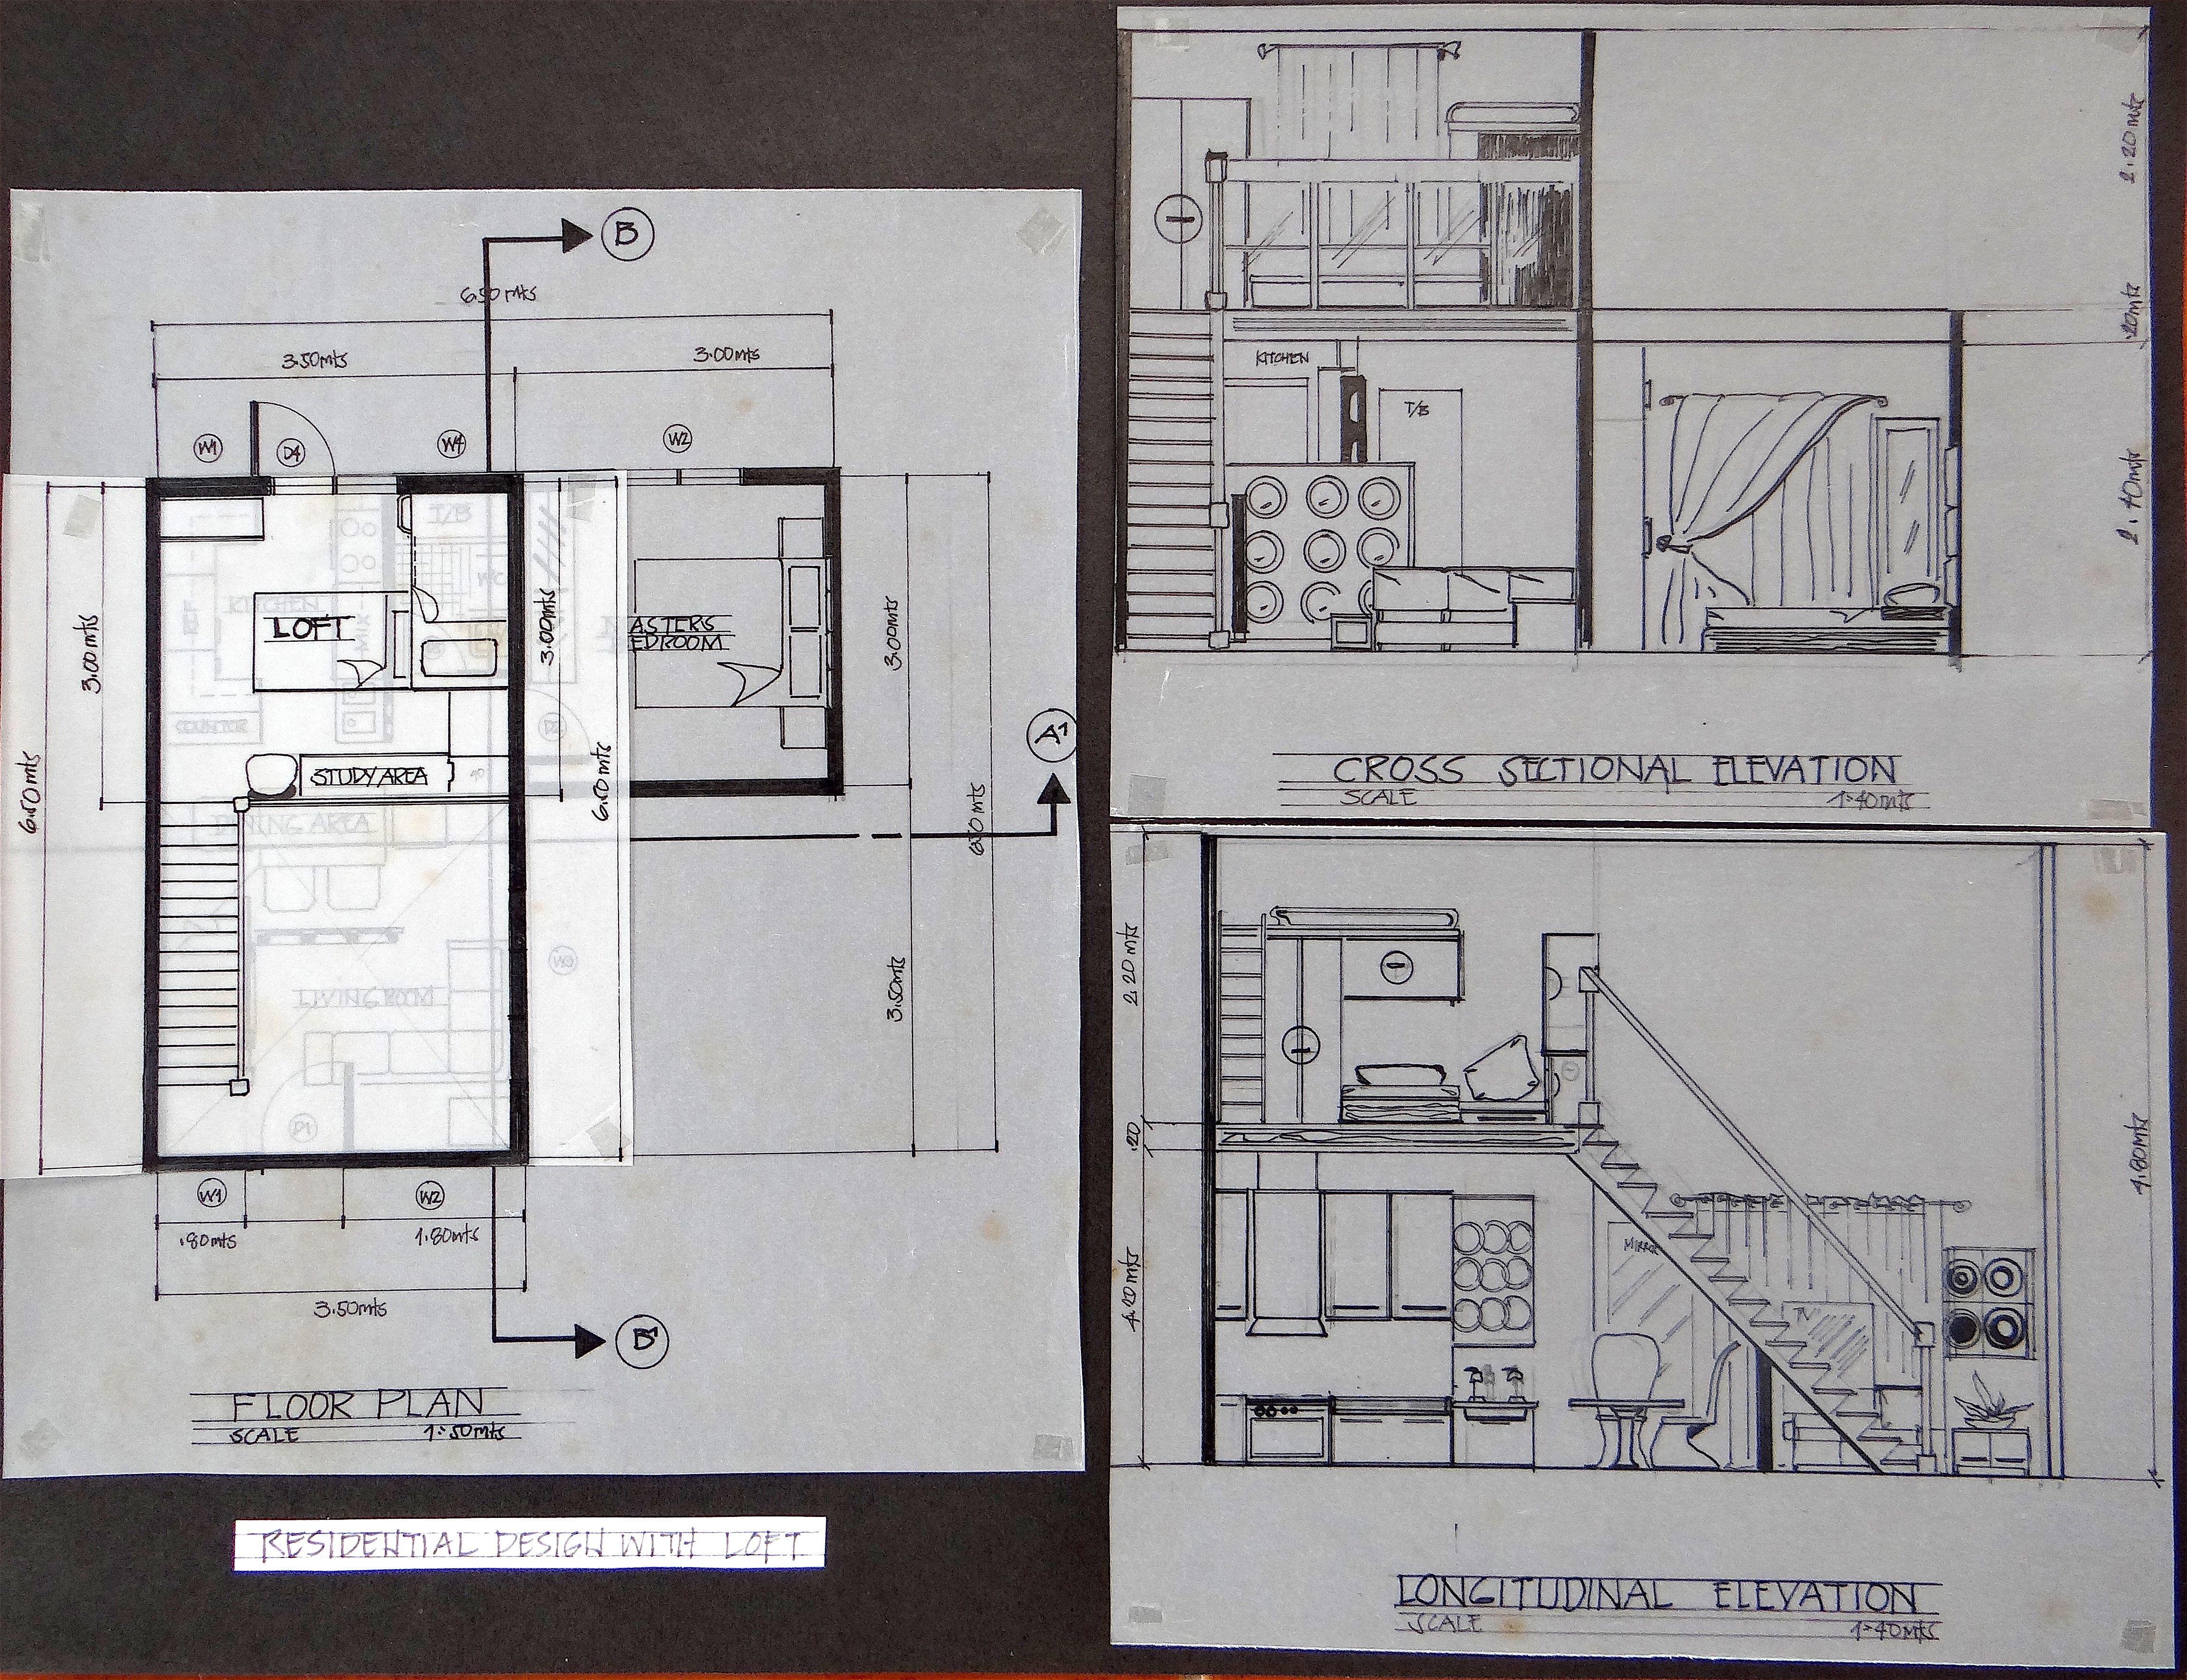 Residential Design With A Loft Residential Design Floor Plans Design